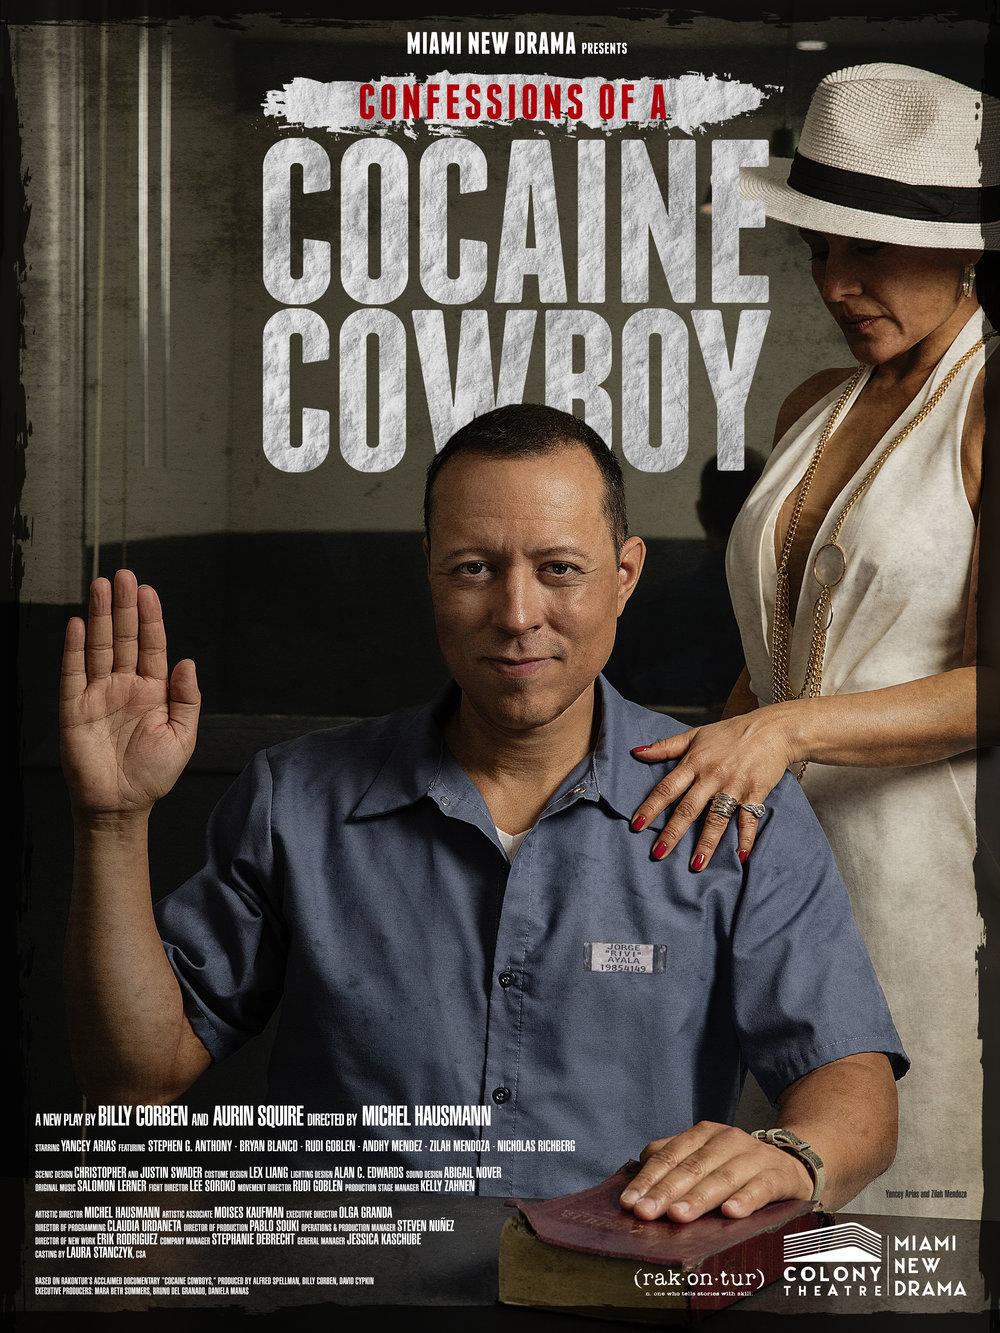 Confessions of a Cocaine Cowboy